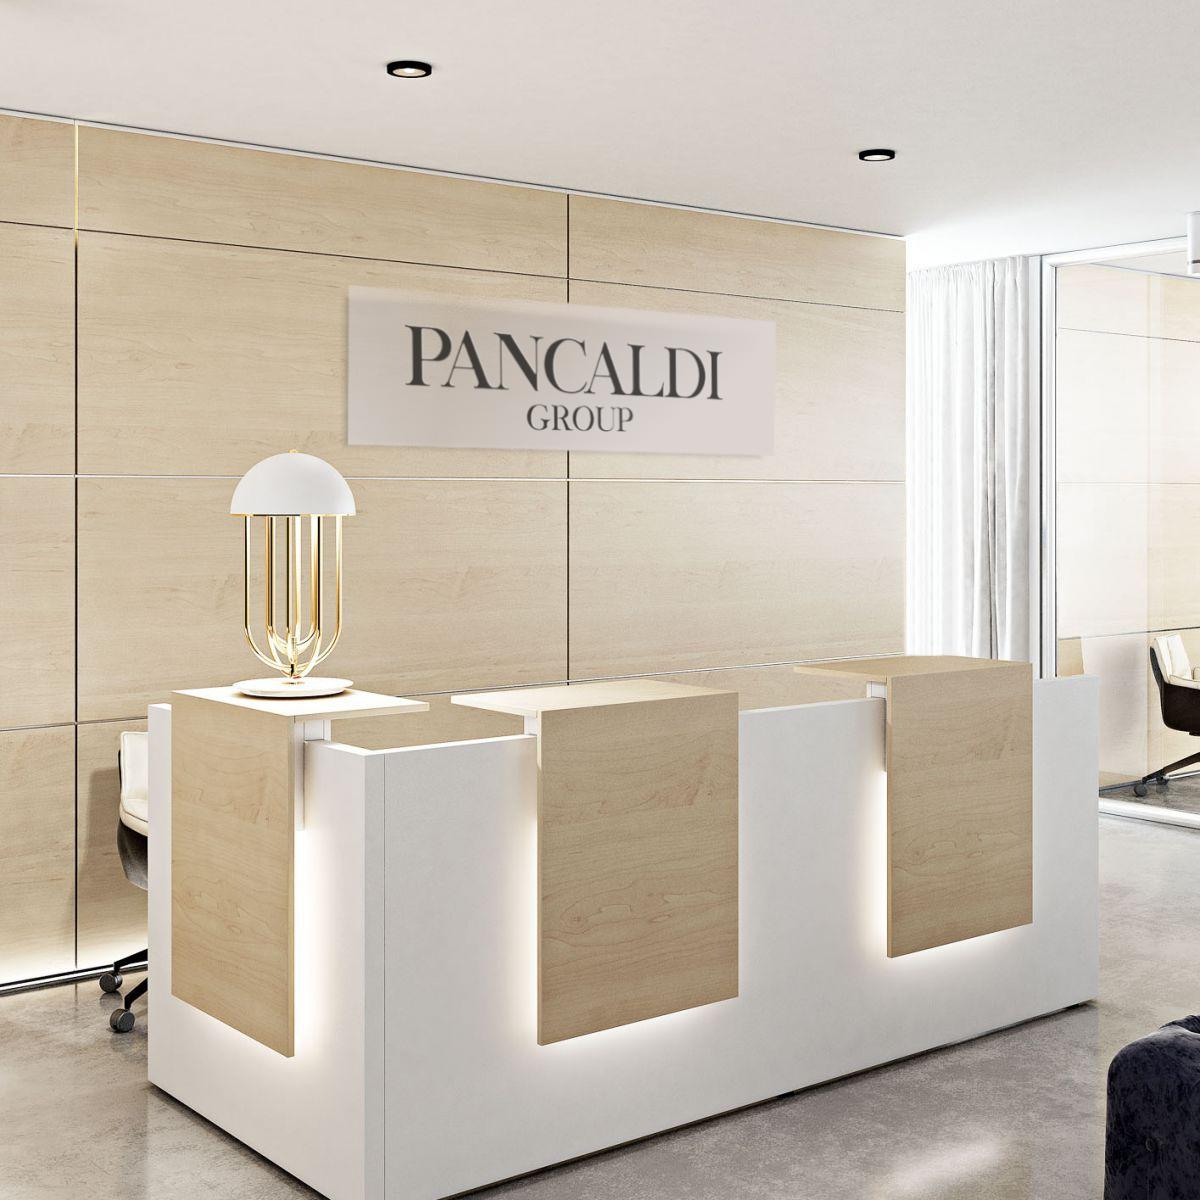 pancaldi_offices_3